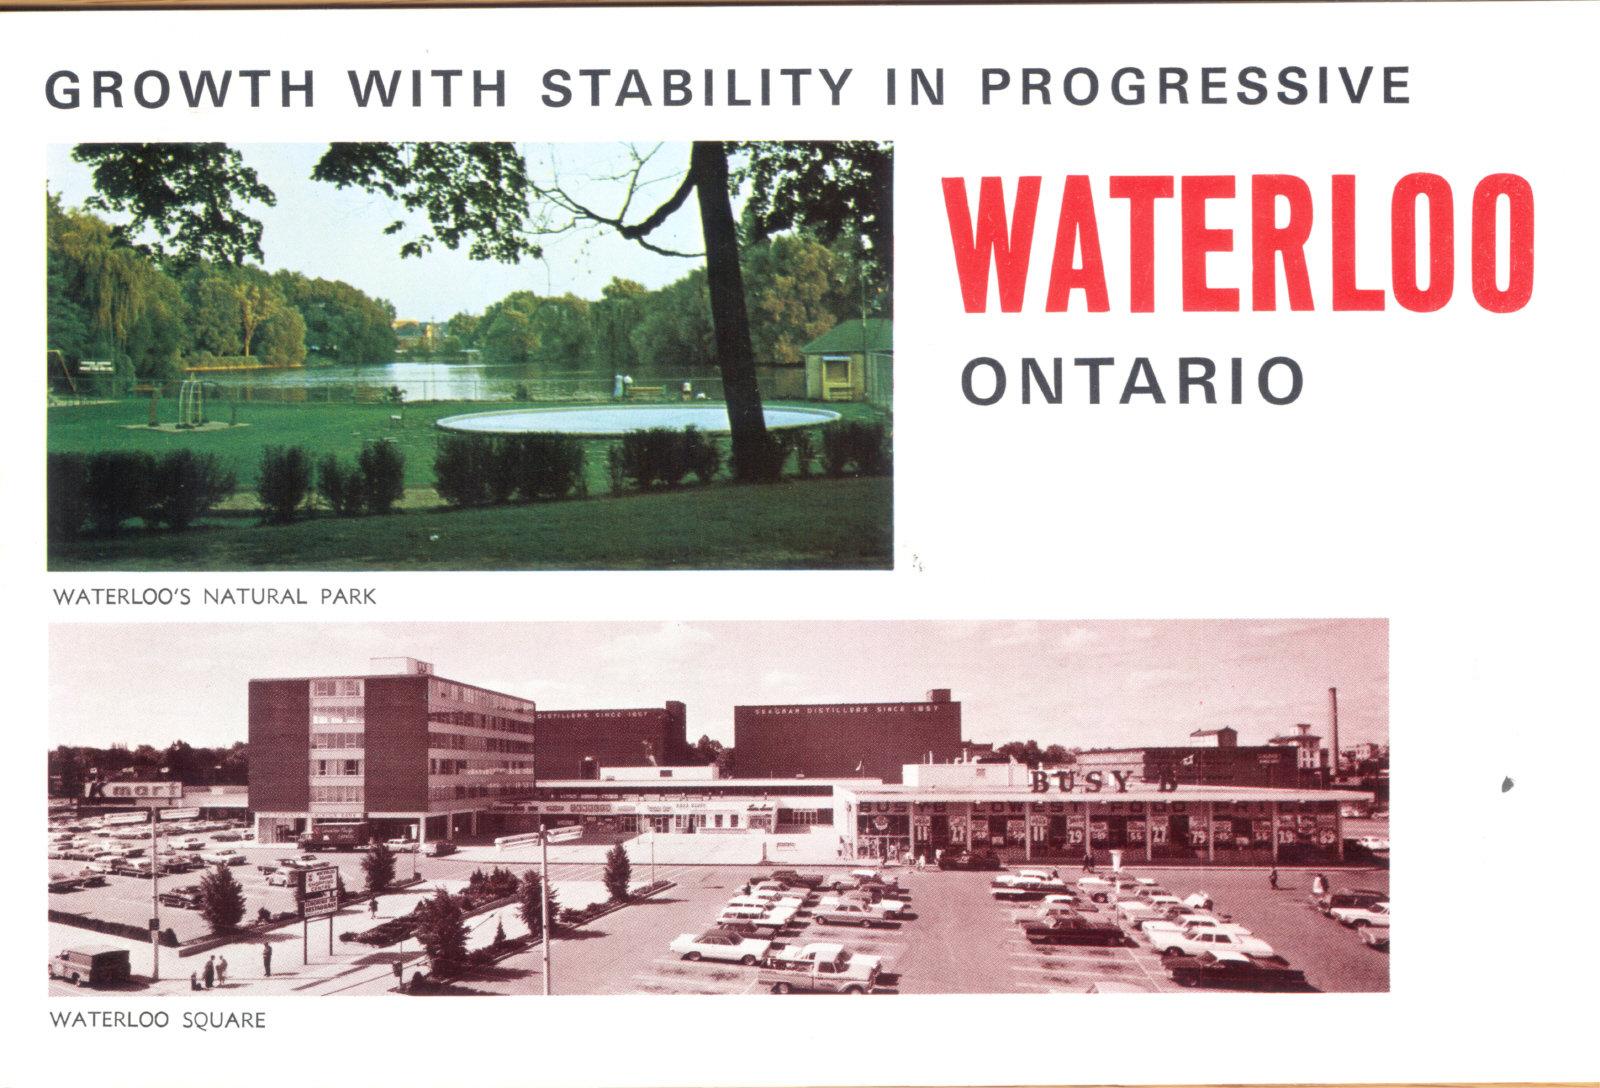 Promotional Brochure for Waterloo, Ontario